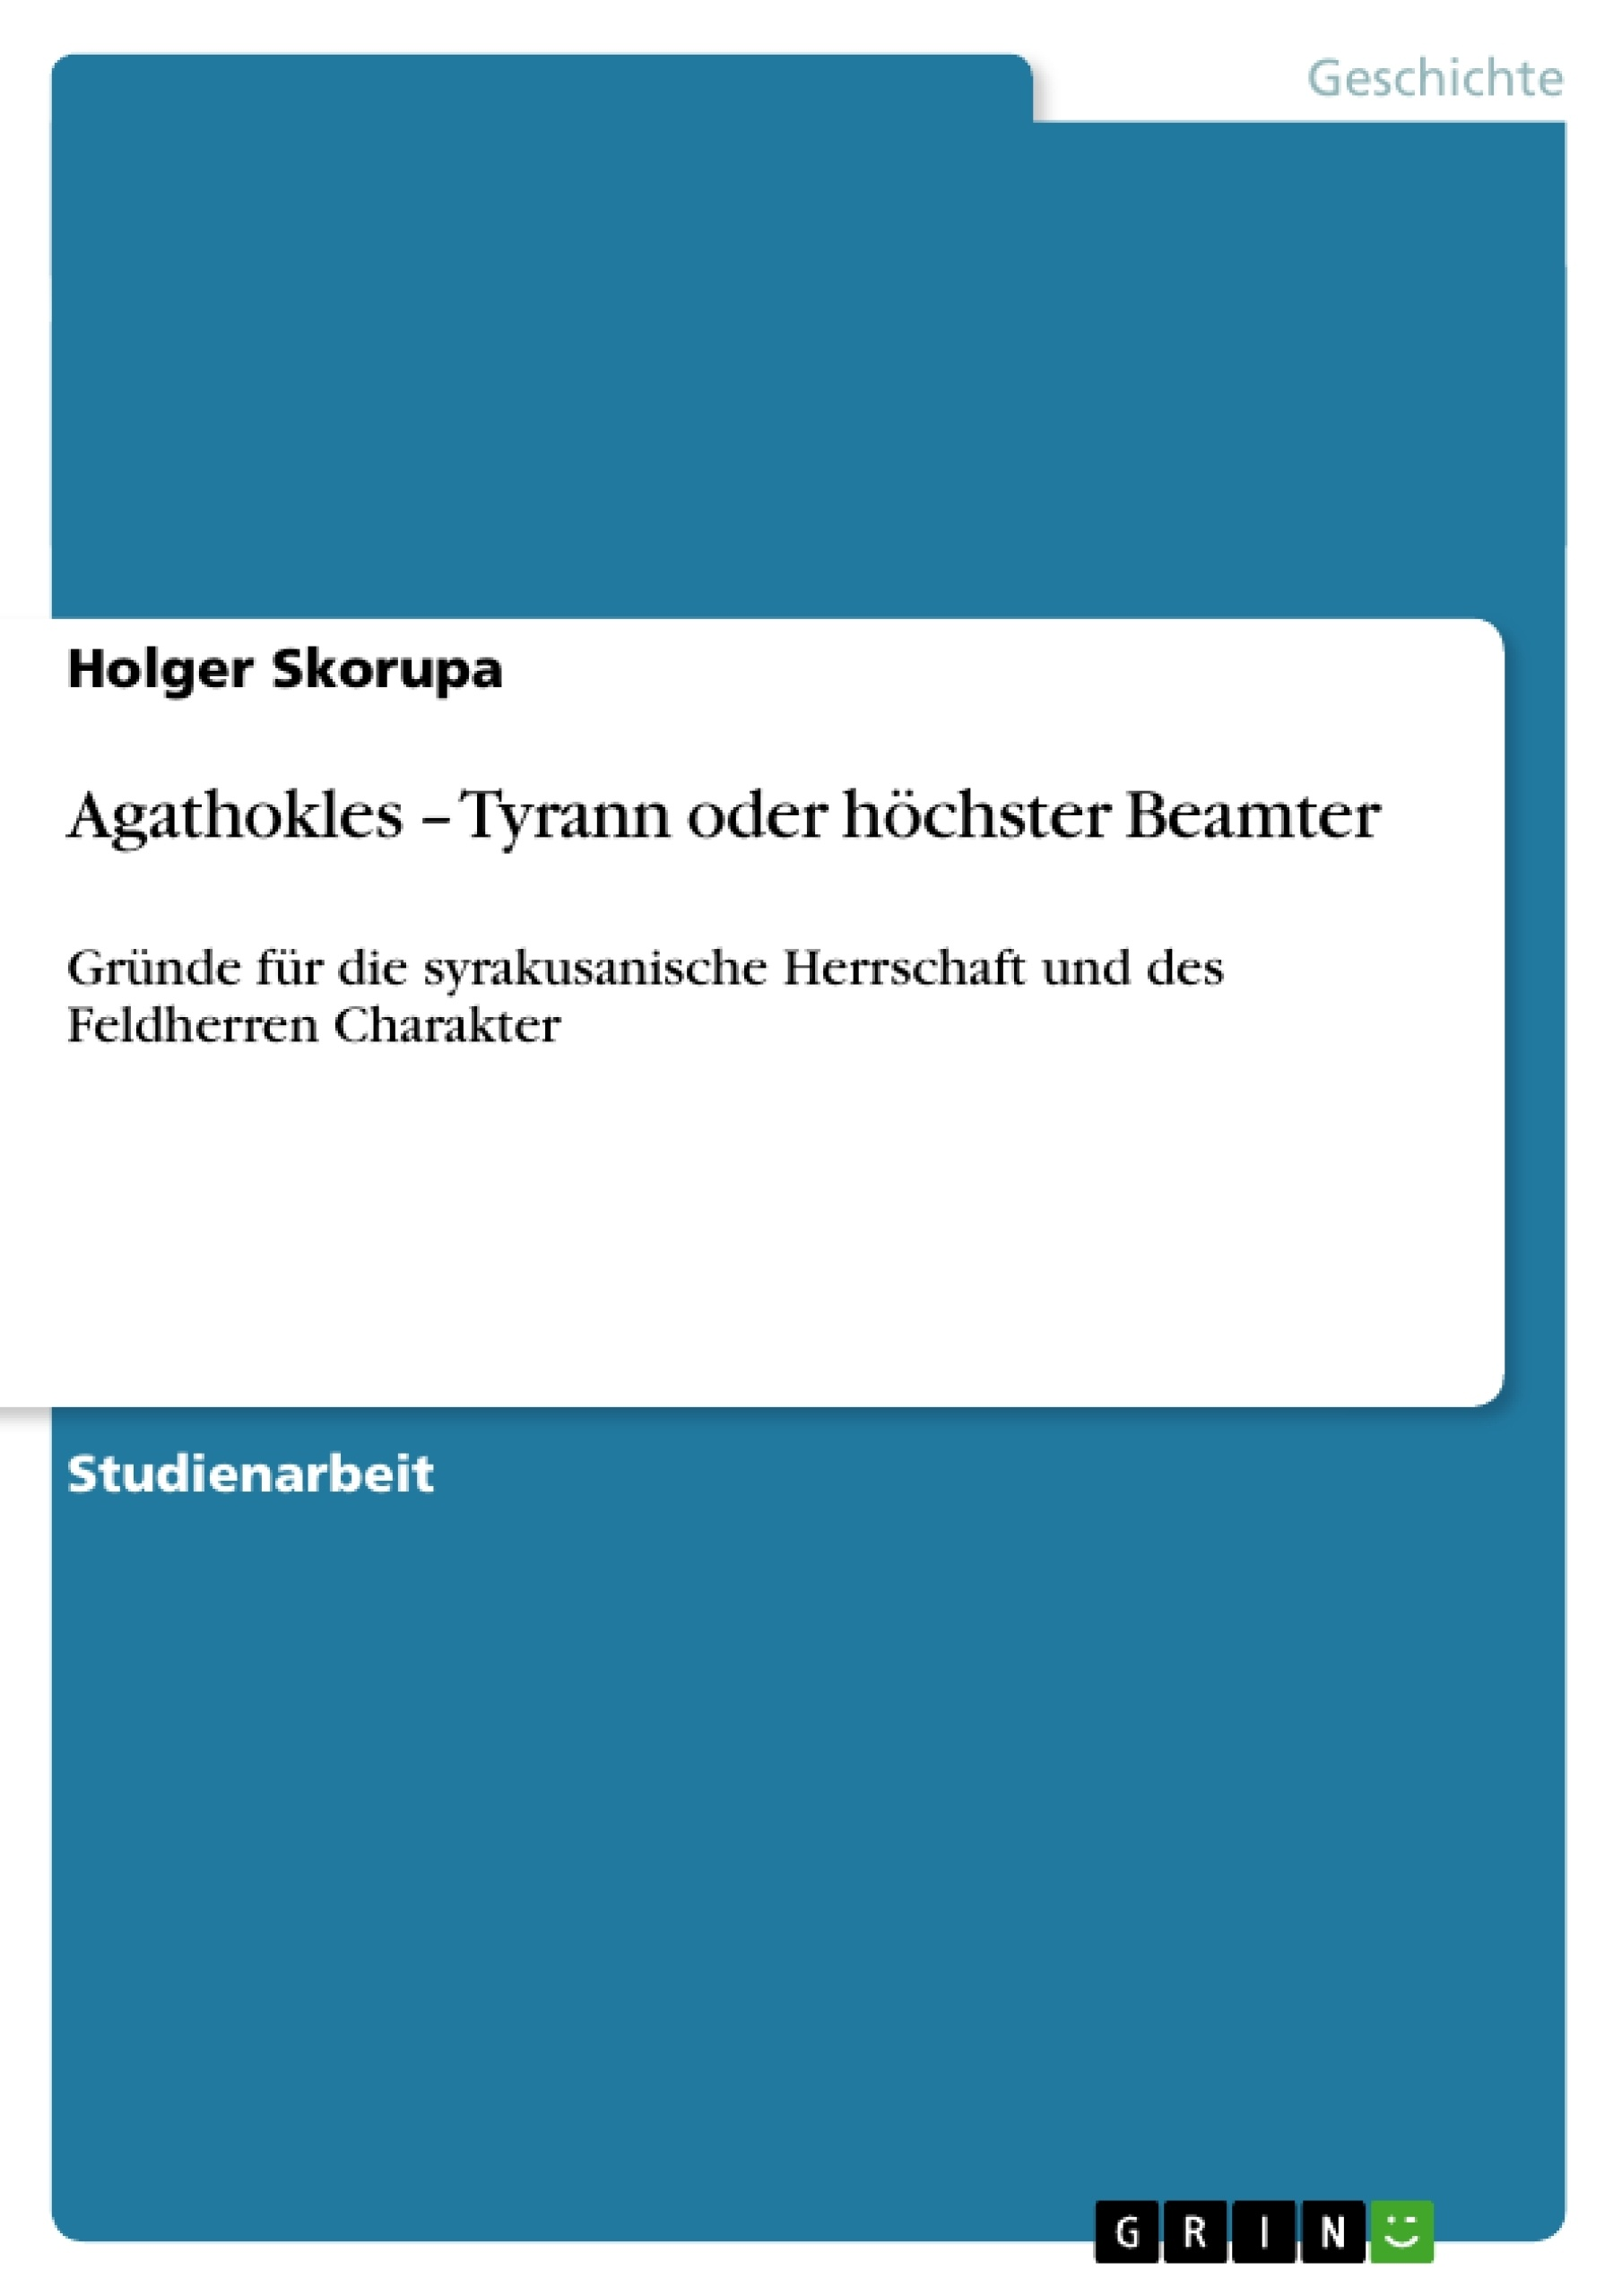 Titel: Agathokles – Tyrann oder höchster Beamter